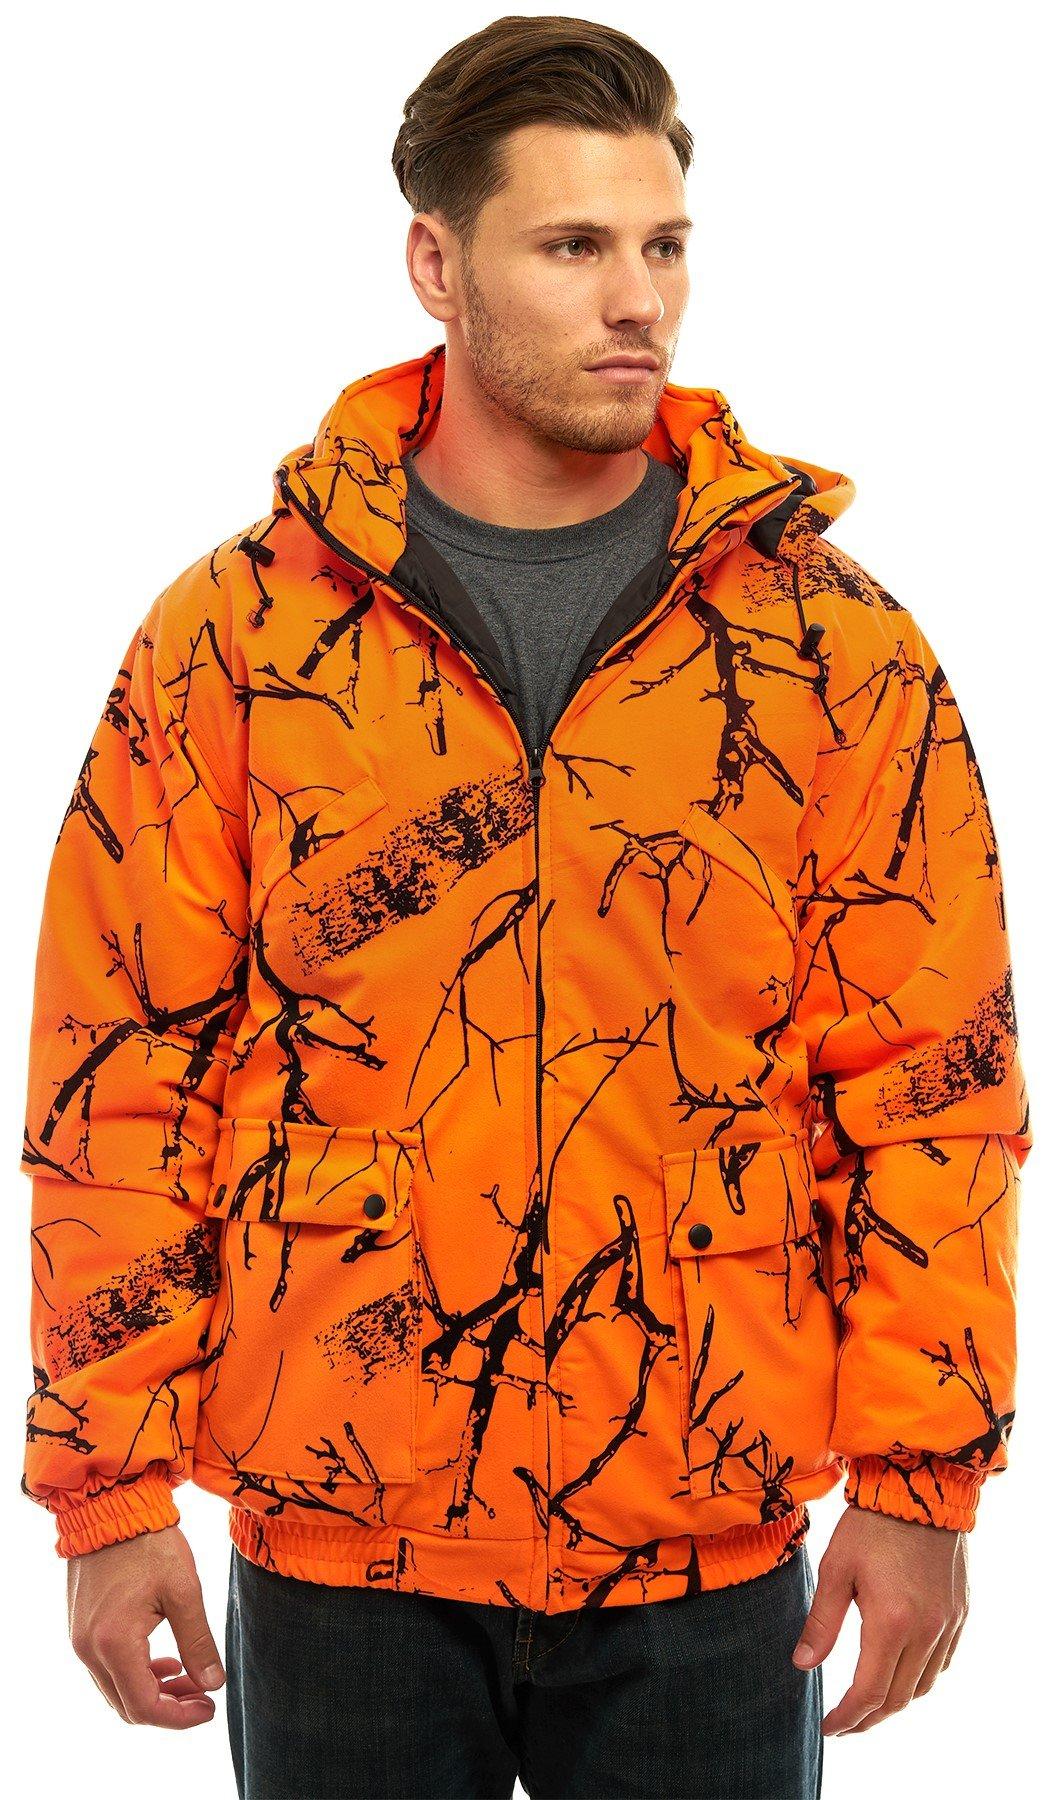 affordable price nice cheap san francisco Trail Crest Men's Safety Blaze Orange/camo Insulated & Waterproof Tanker  Jacket 2xl Orange Camo